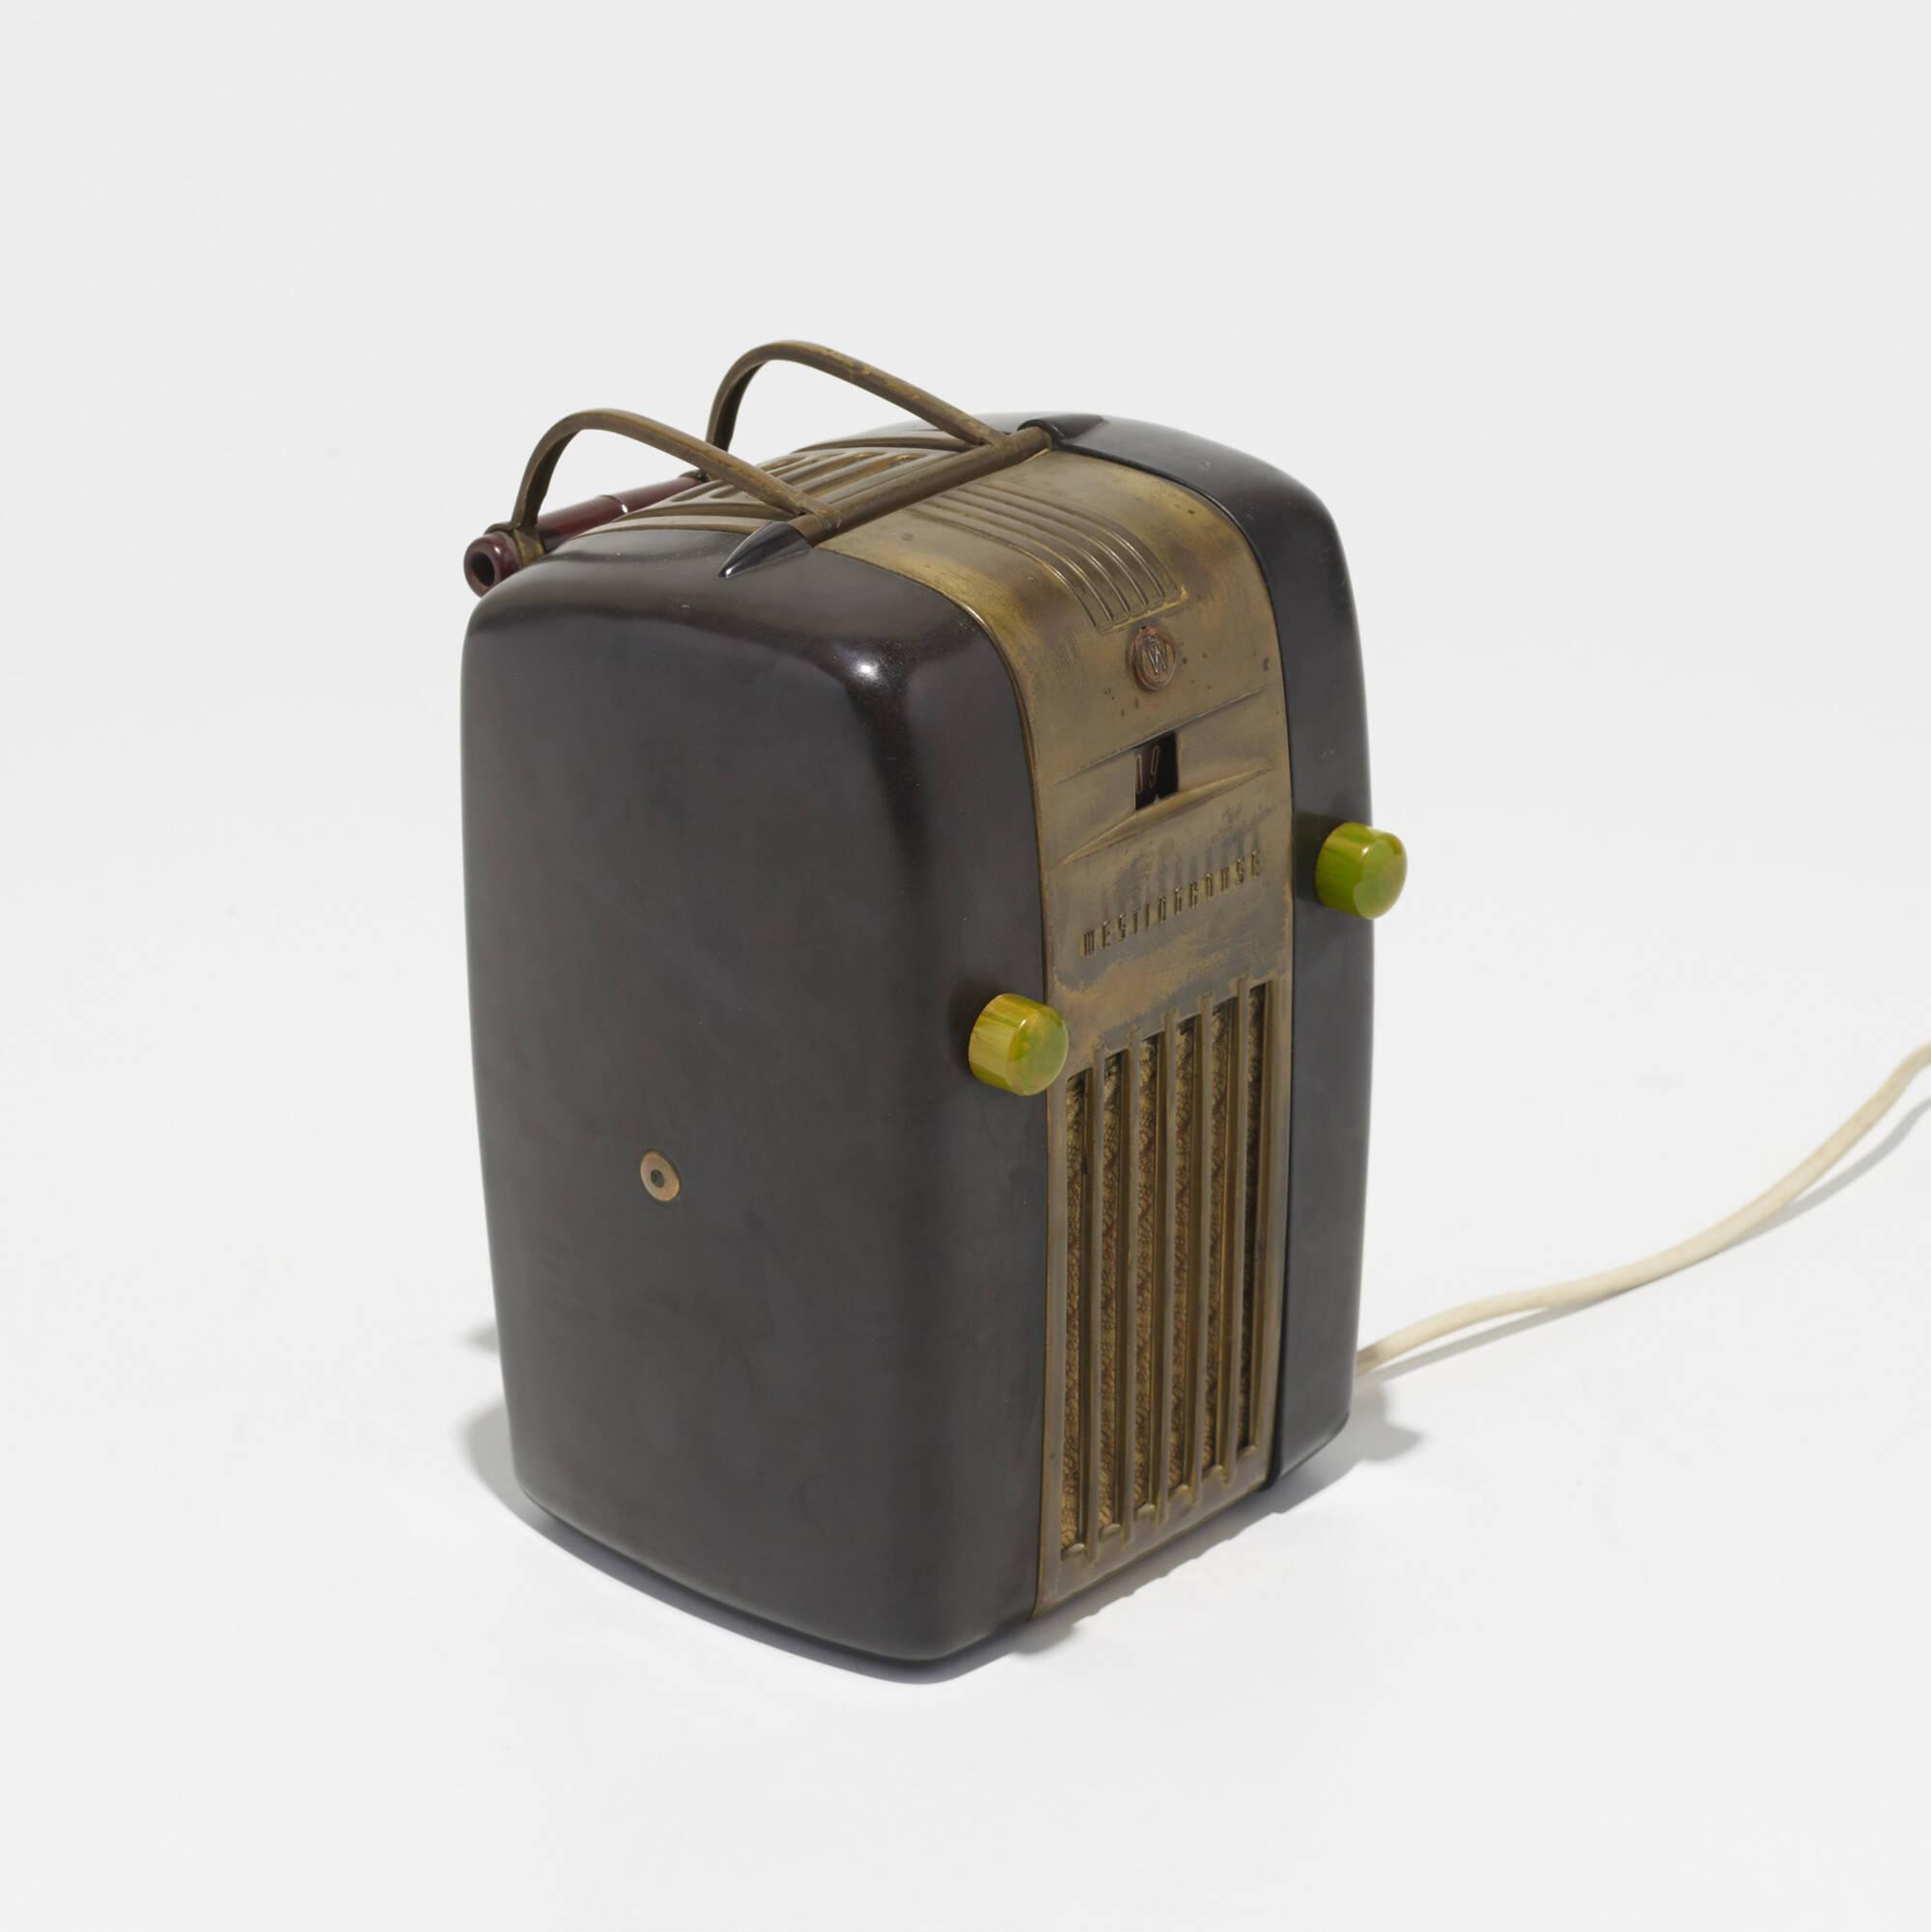 160: Westinghouse / radio, model H-126 (2 of 2)